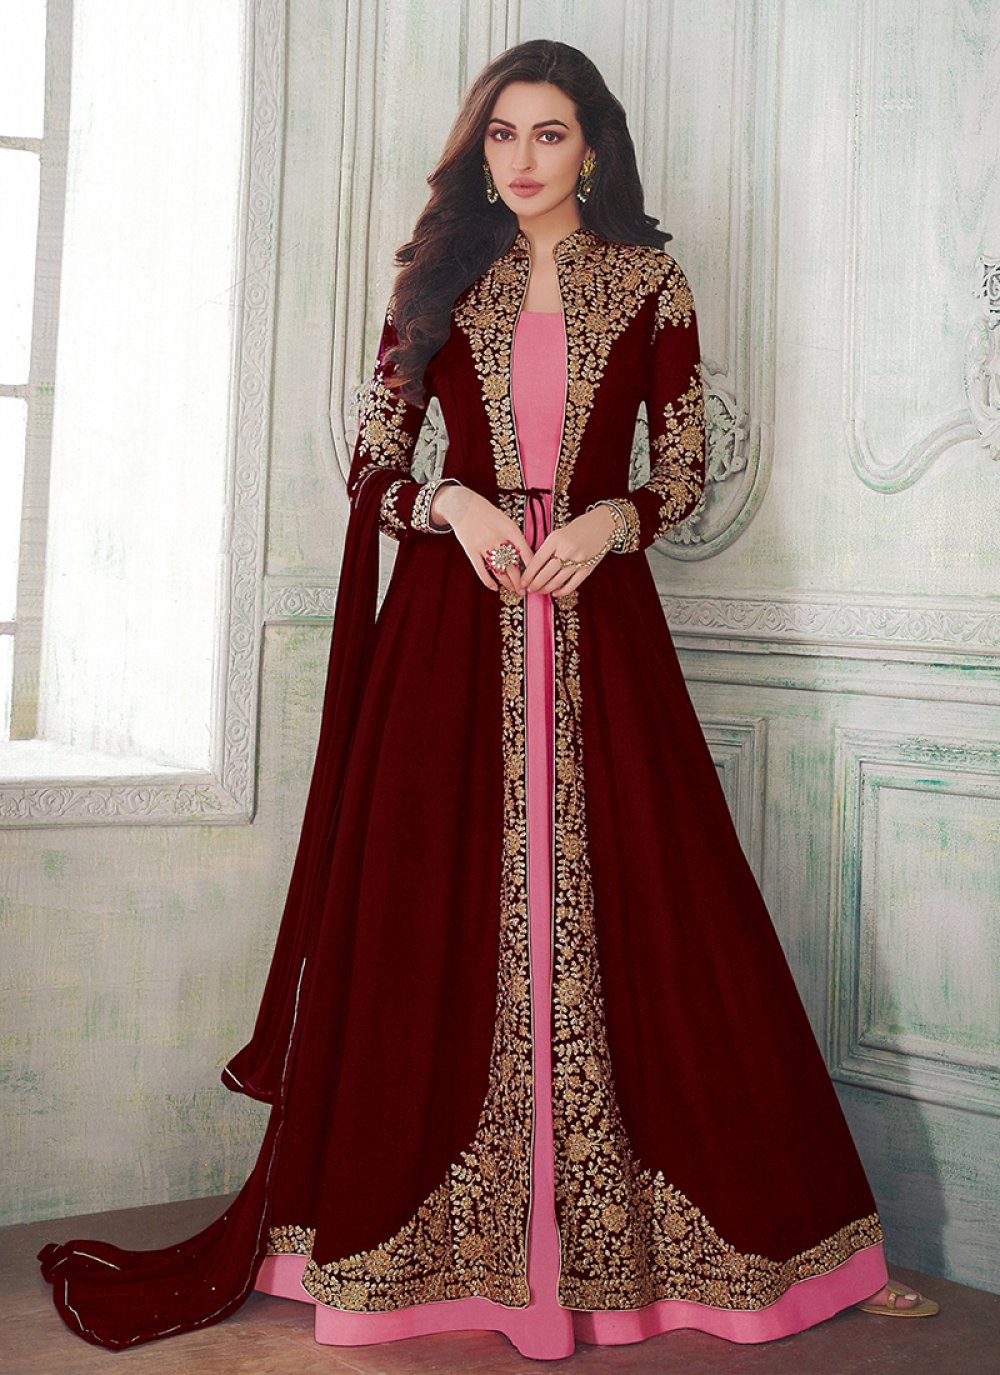 Resham Maroon and Pink Floor Length Anarkali Suit